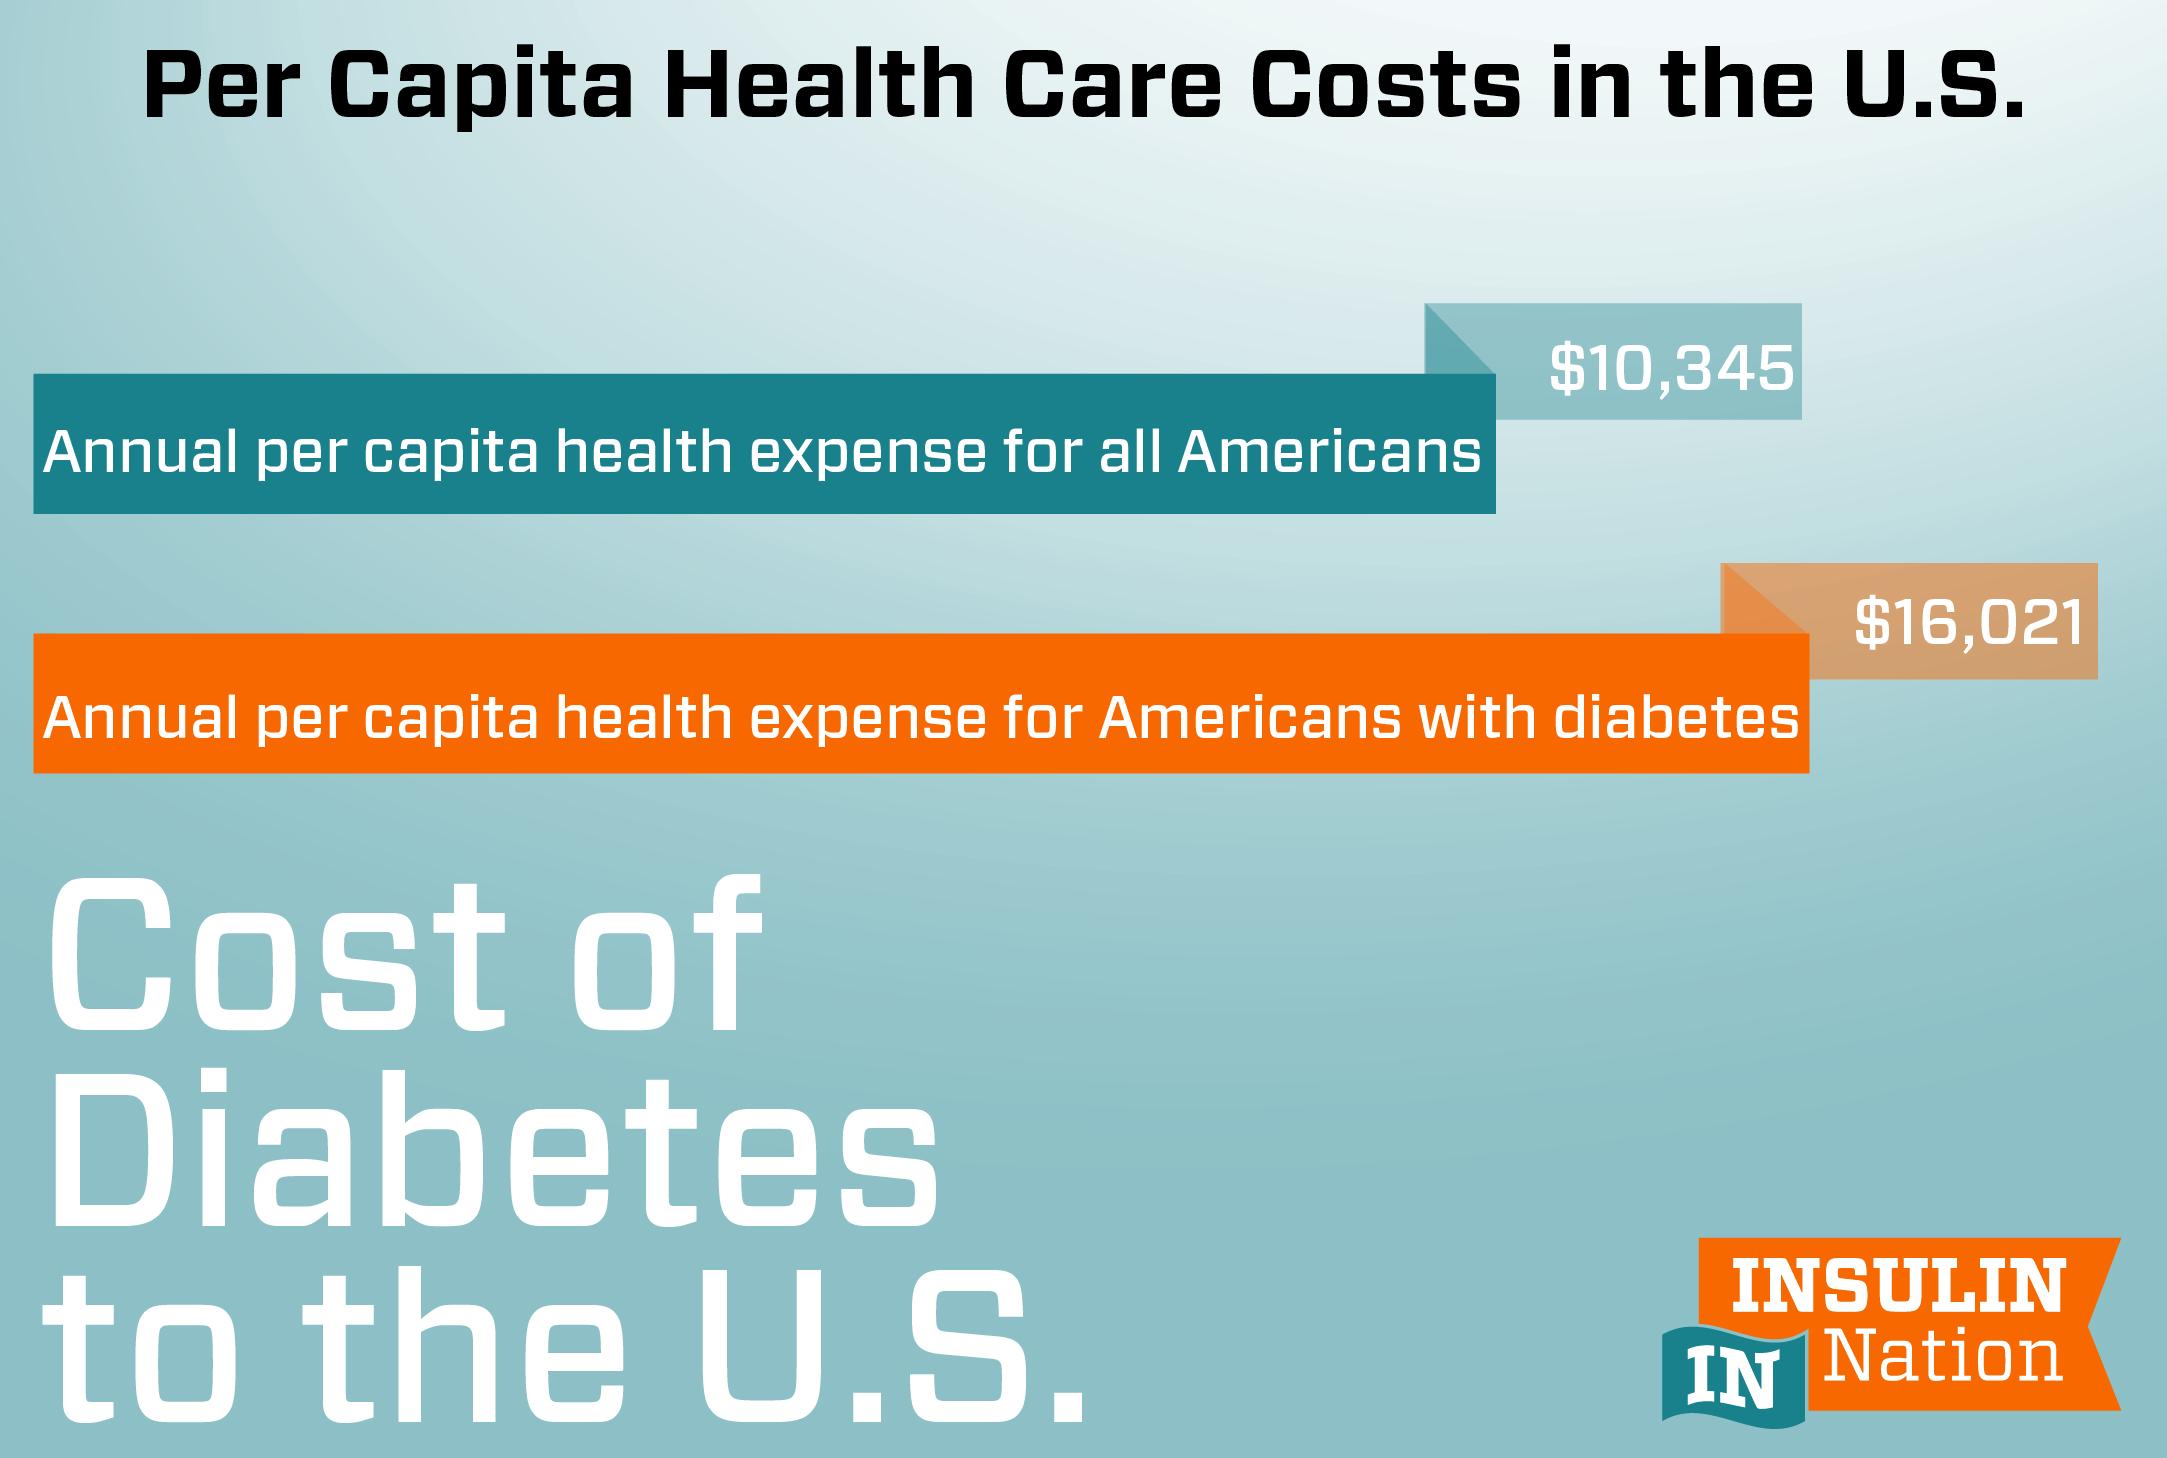 insulin_nation_diabetes_price_usa-02